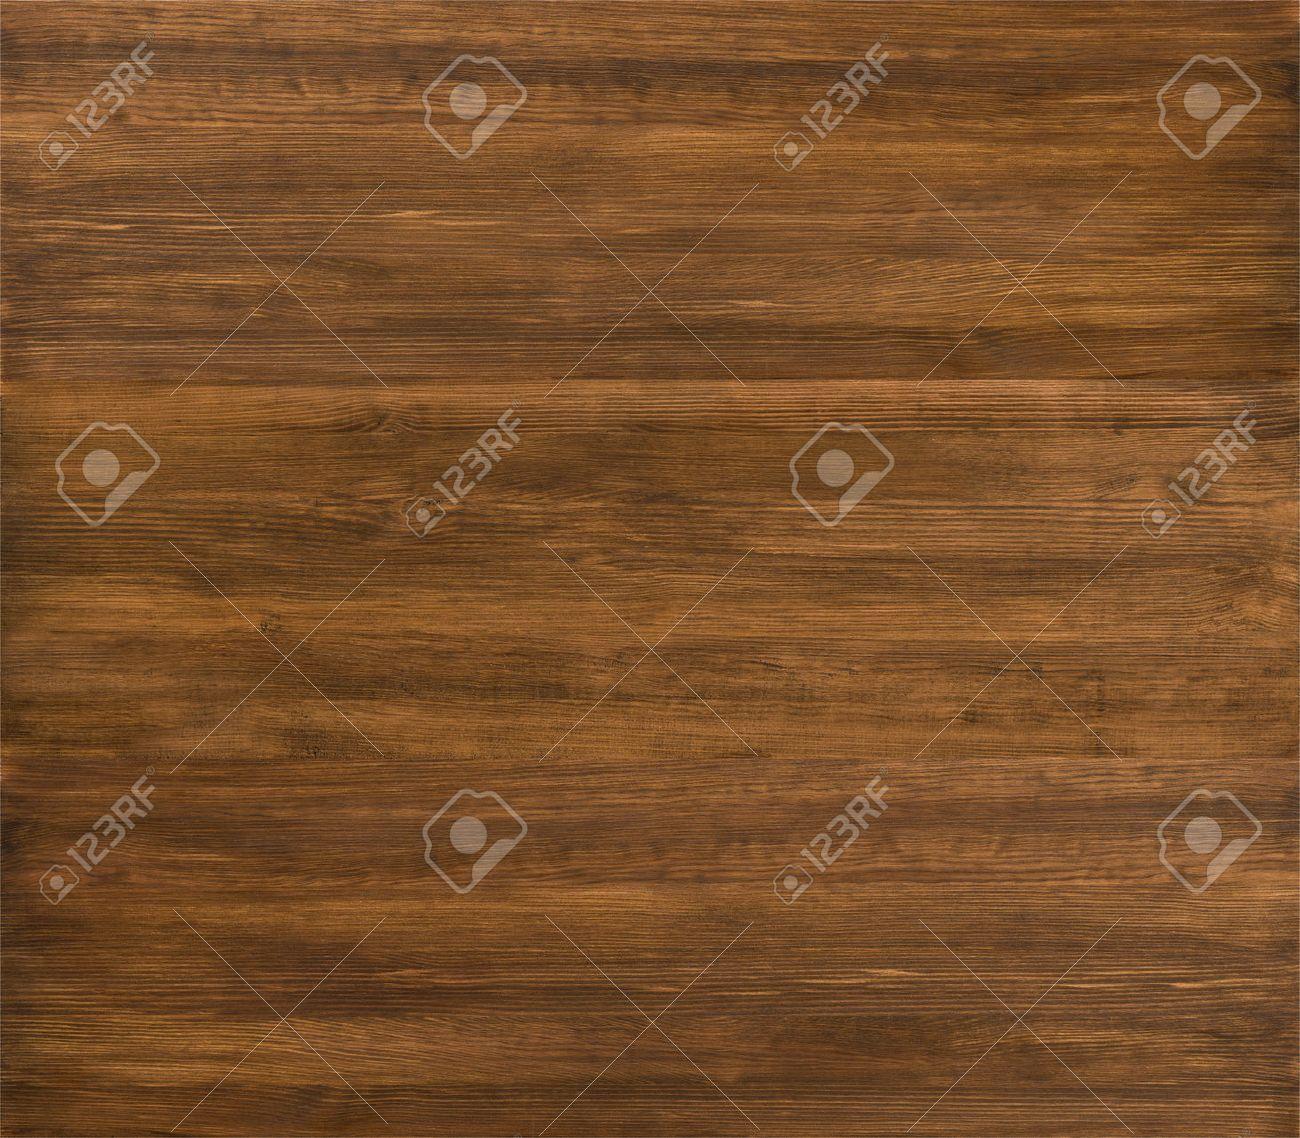 Wooden texture  dark brown wood background Stock Photo   48054530. Wooden Texture  Dark Brown Wood Background Stock Photo  Picture